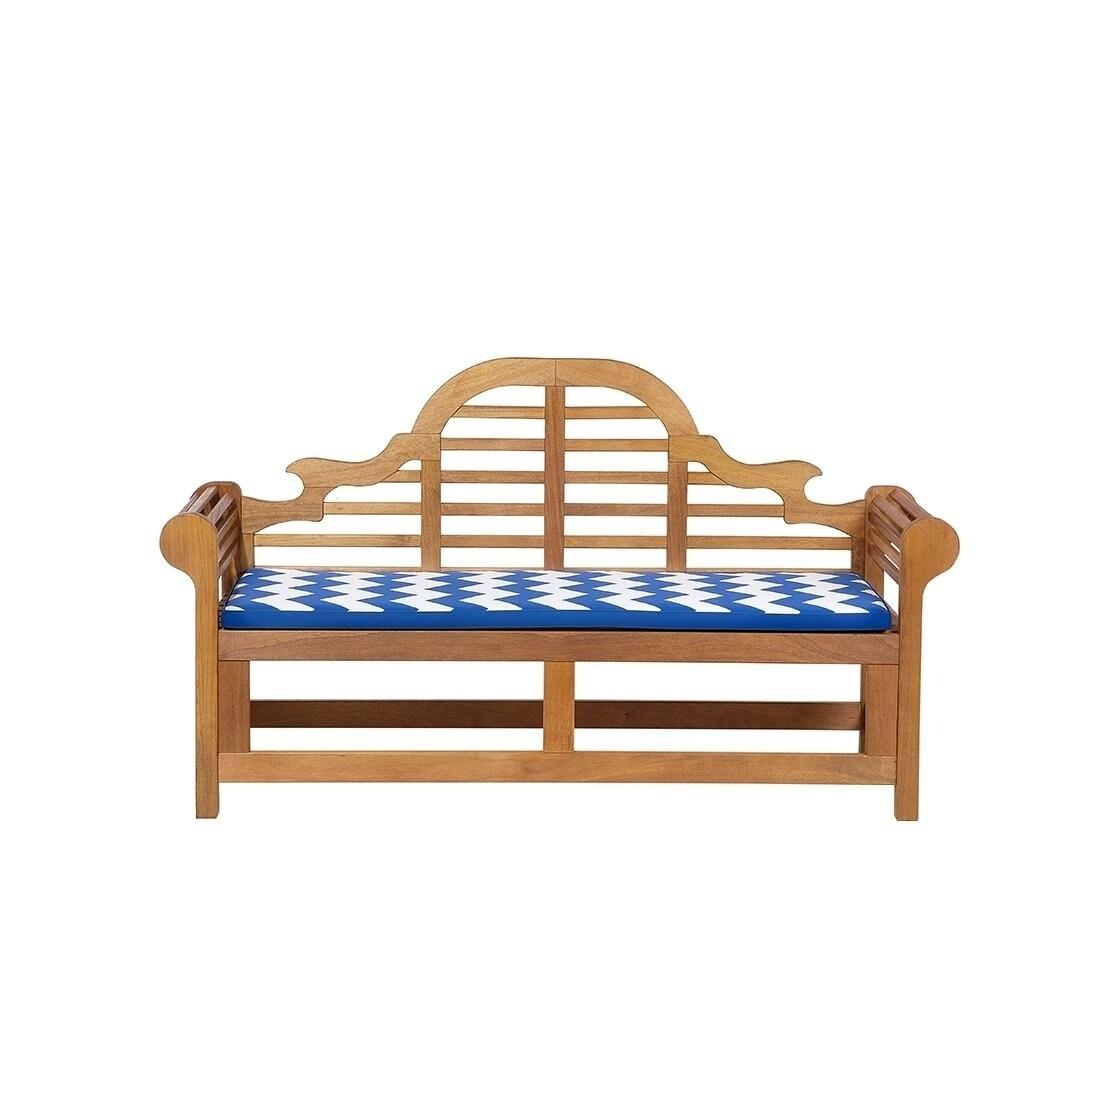 Garden bench seat cushion chevron blue marlboro